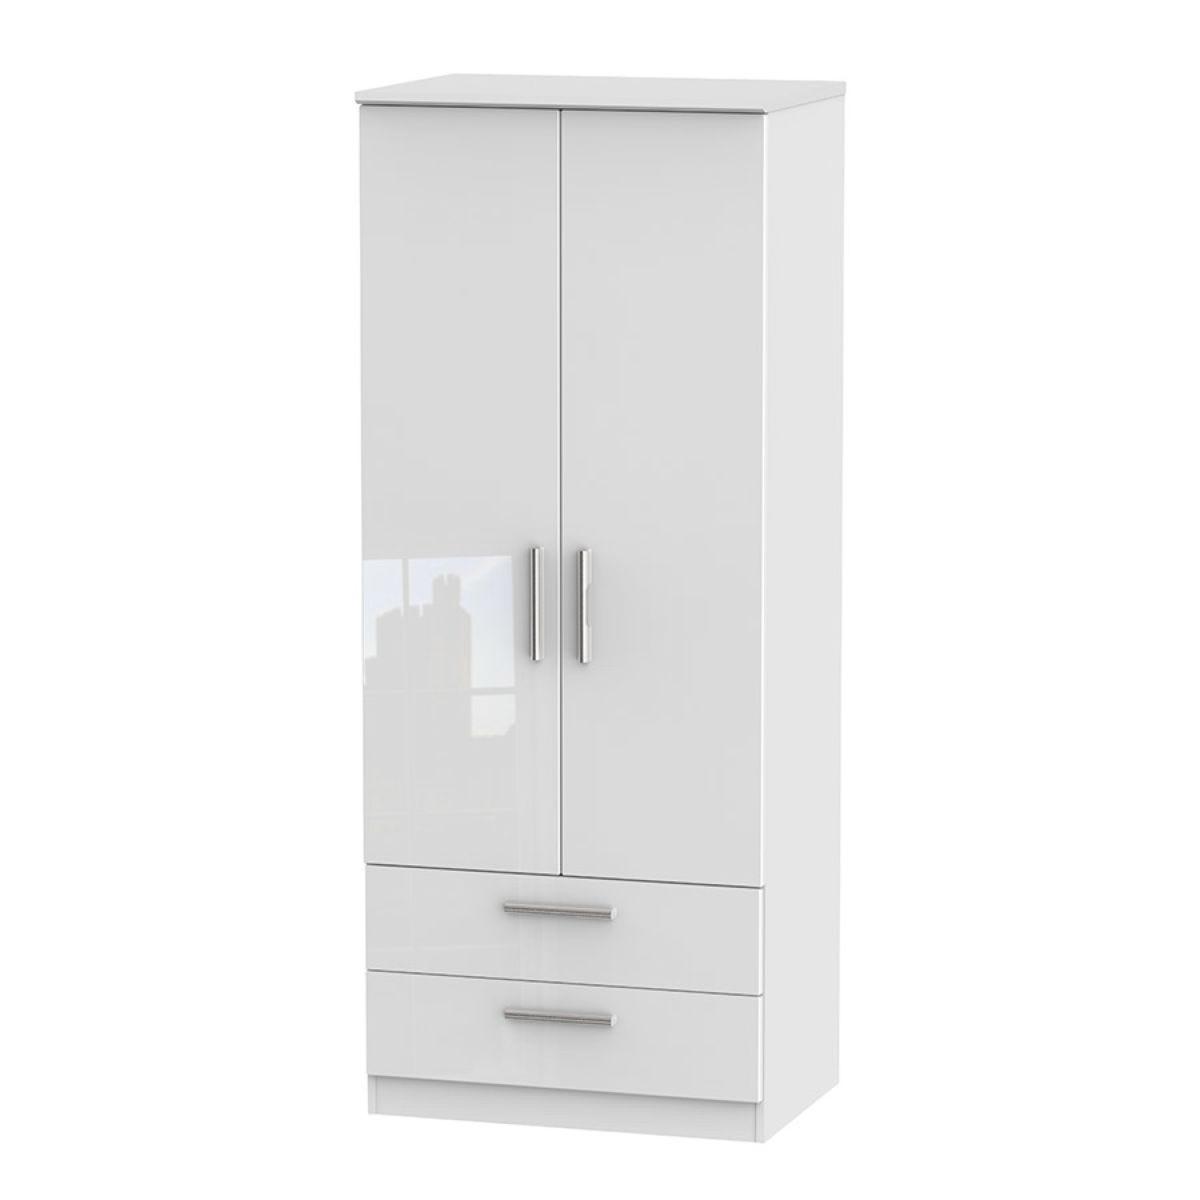 Fourisse 2-Door Wardrobe with Drawers - White